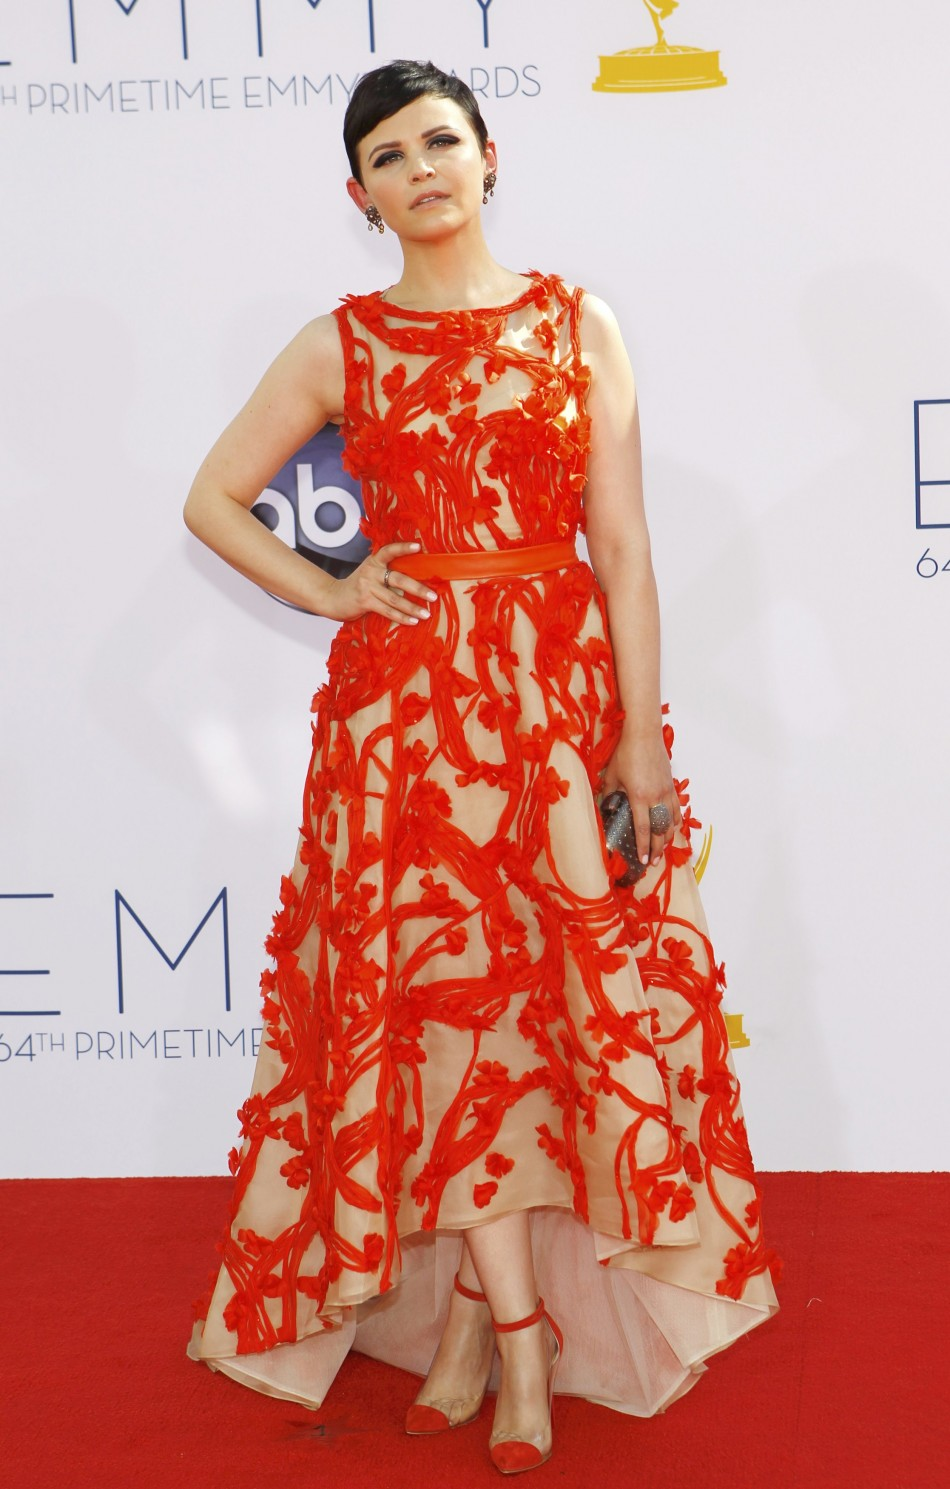 Actress Ginnifer Goodwin, of the drama series